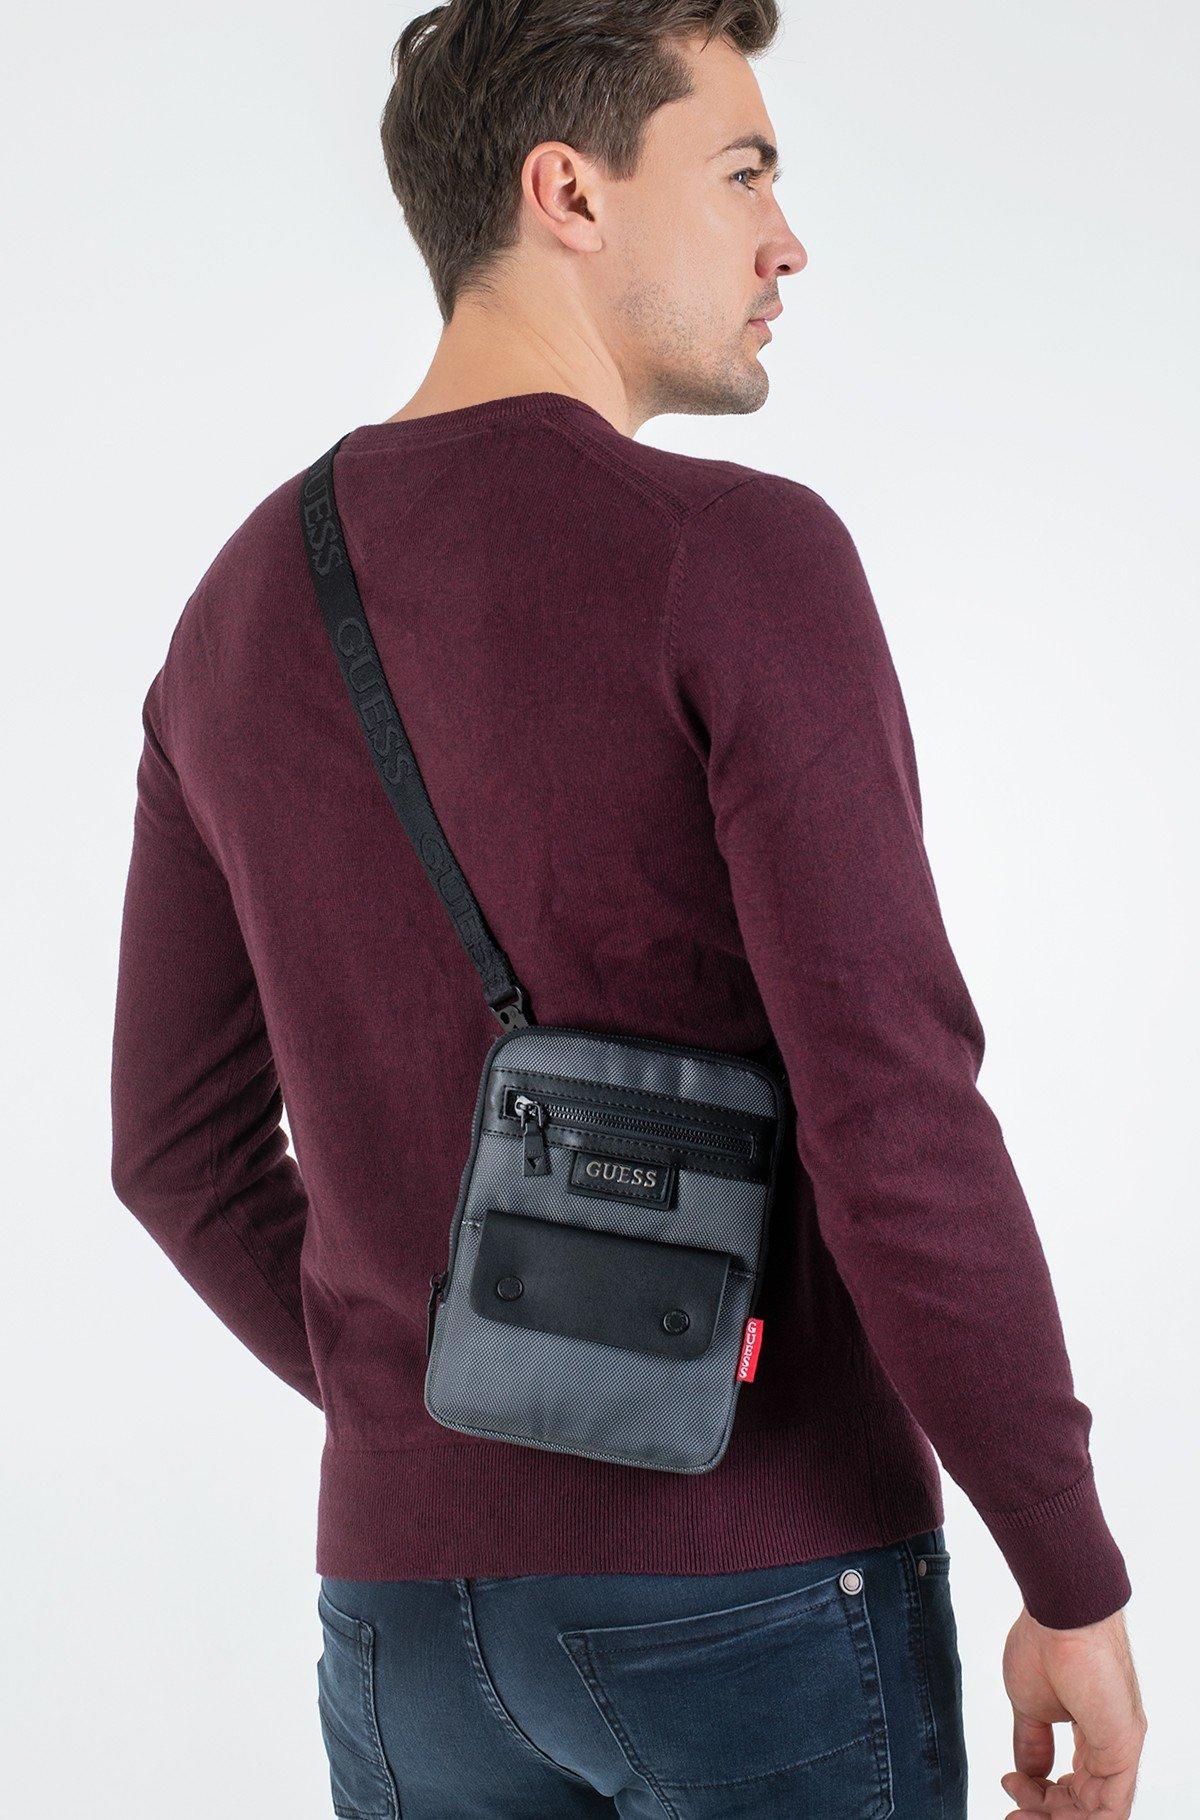 Shoulder bag HMDANN P0327-full-1